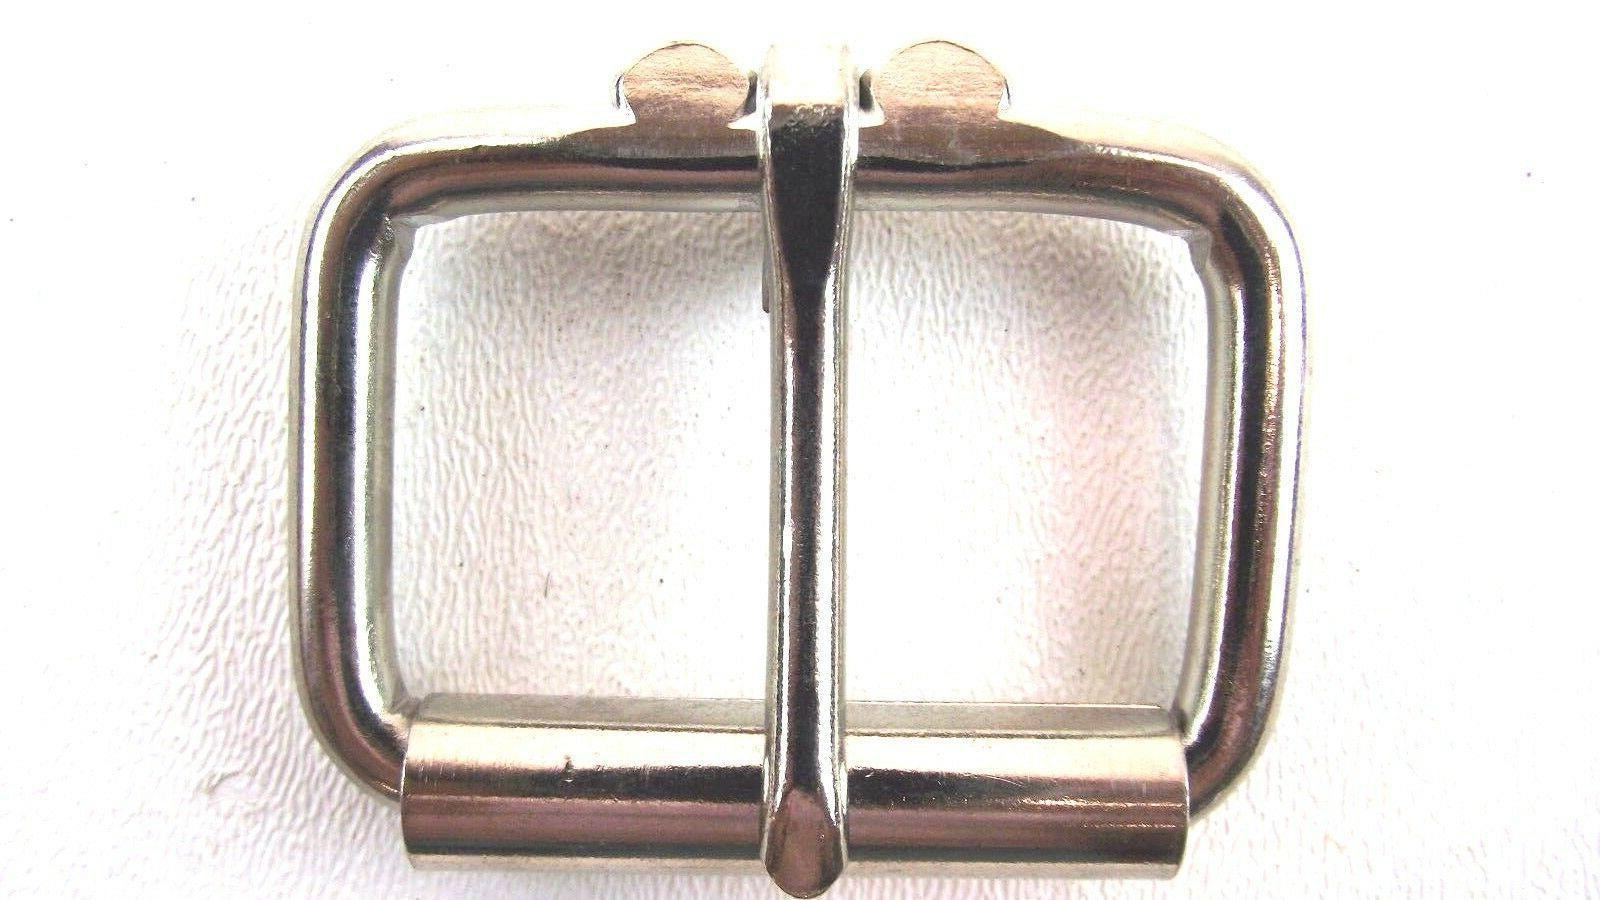 heavy duty stainless finish roller belt buckle